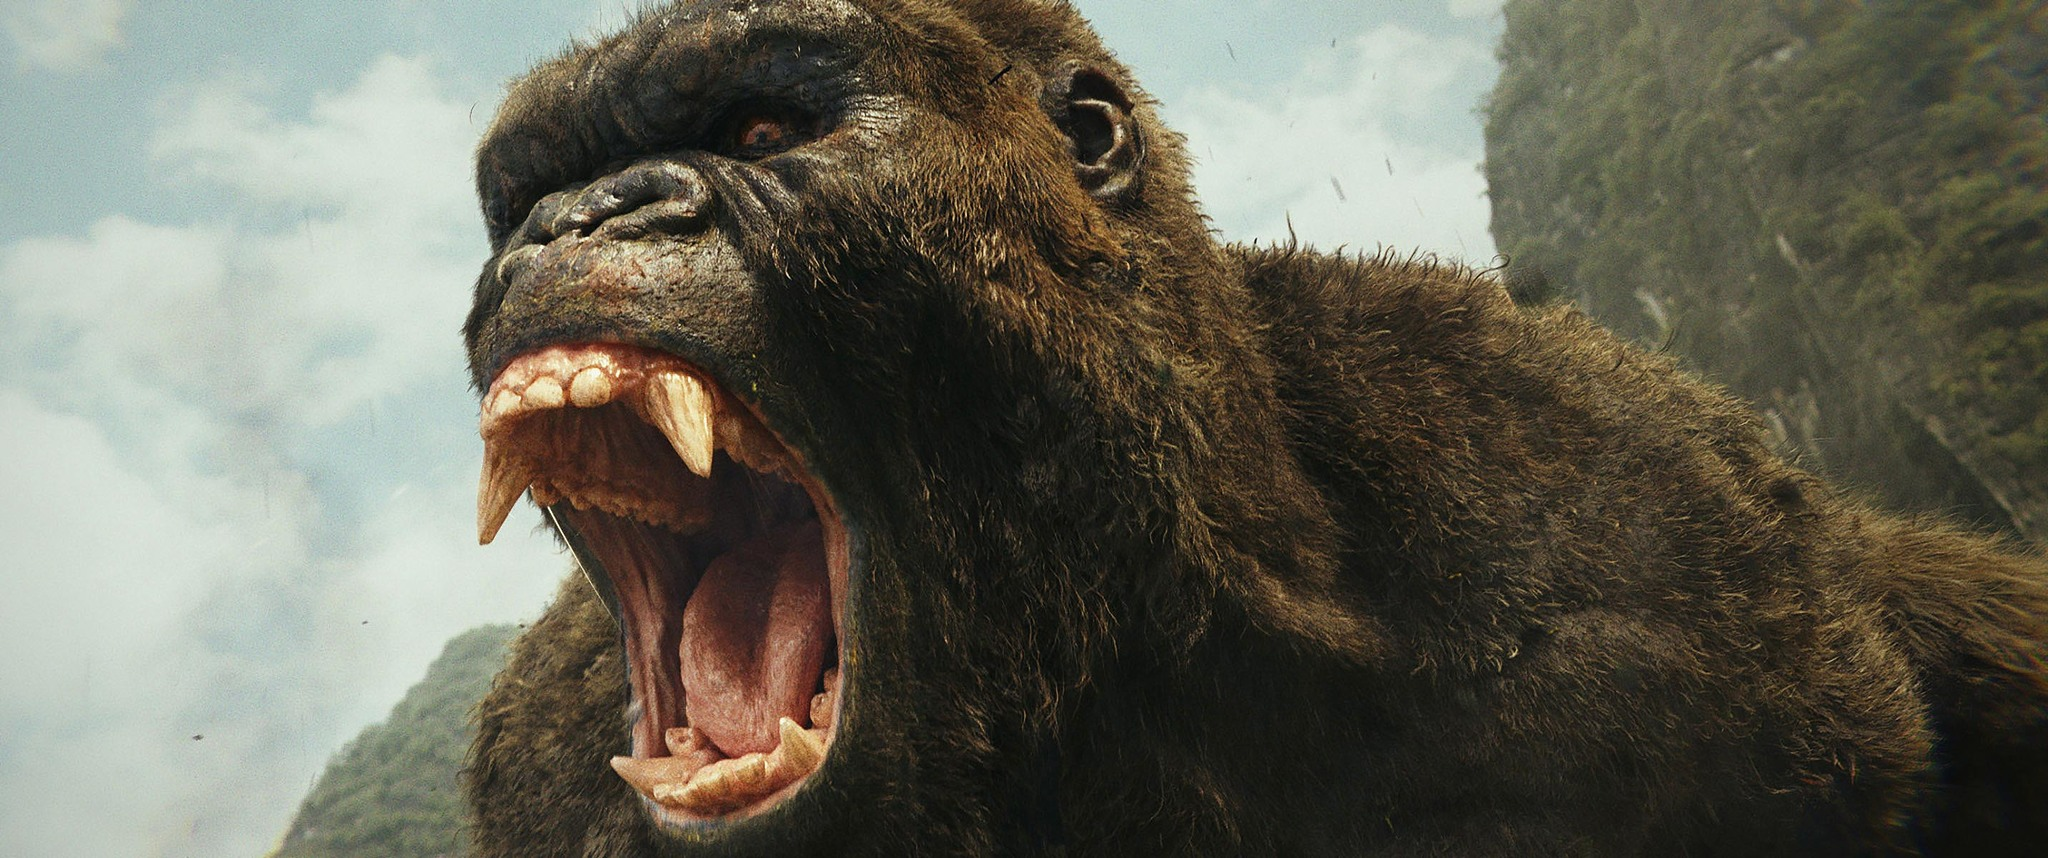 Kong: Skull Island (2017) - Photo Gallery - IMDb